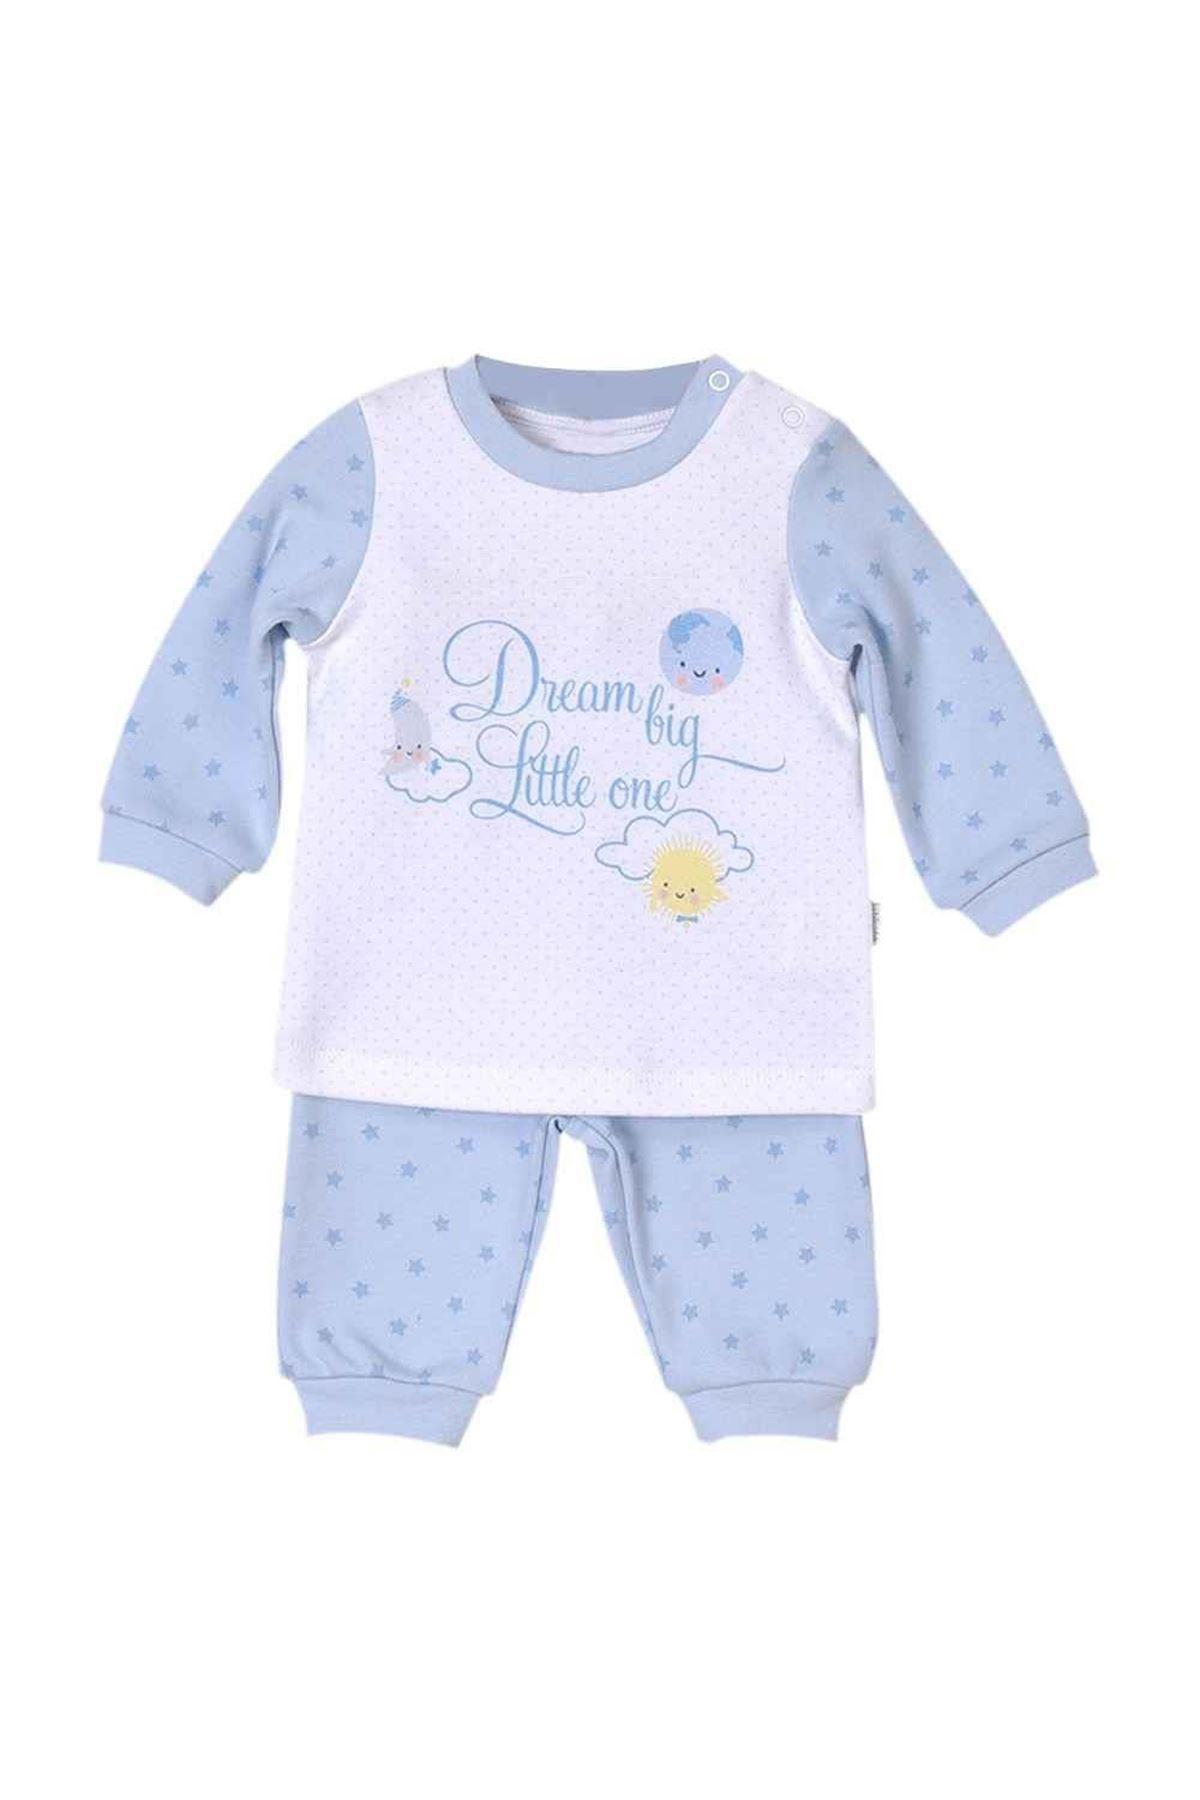 KitiKate Organik Dreams Big Little One 2'li Takım 59175 Mavi